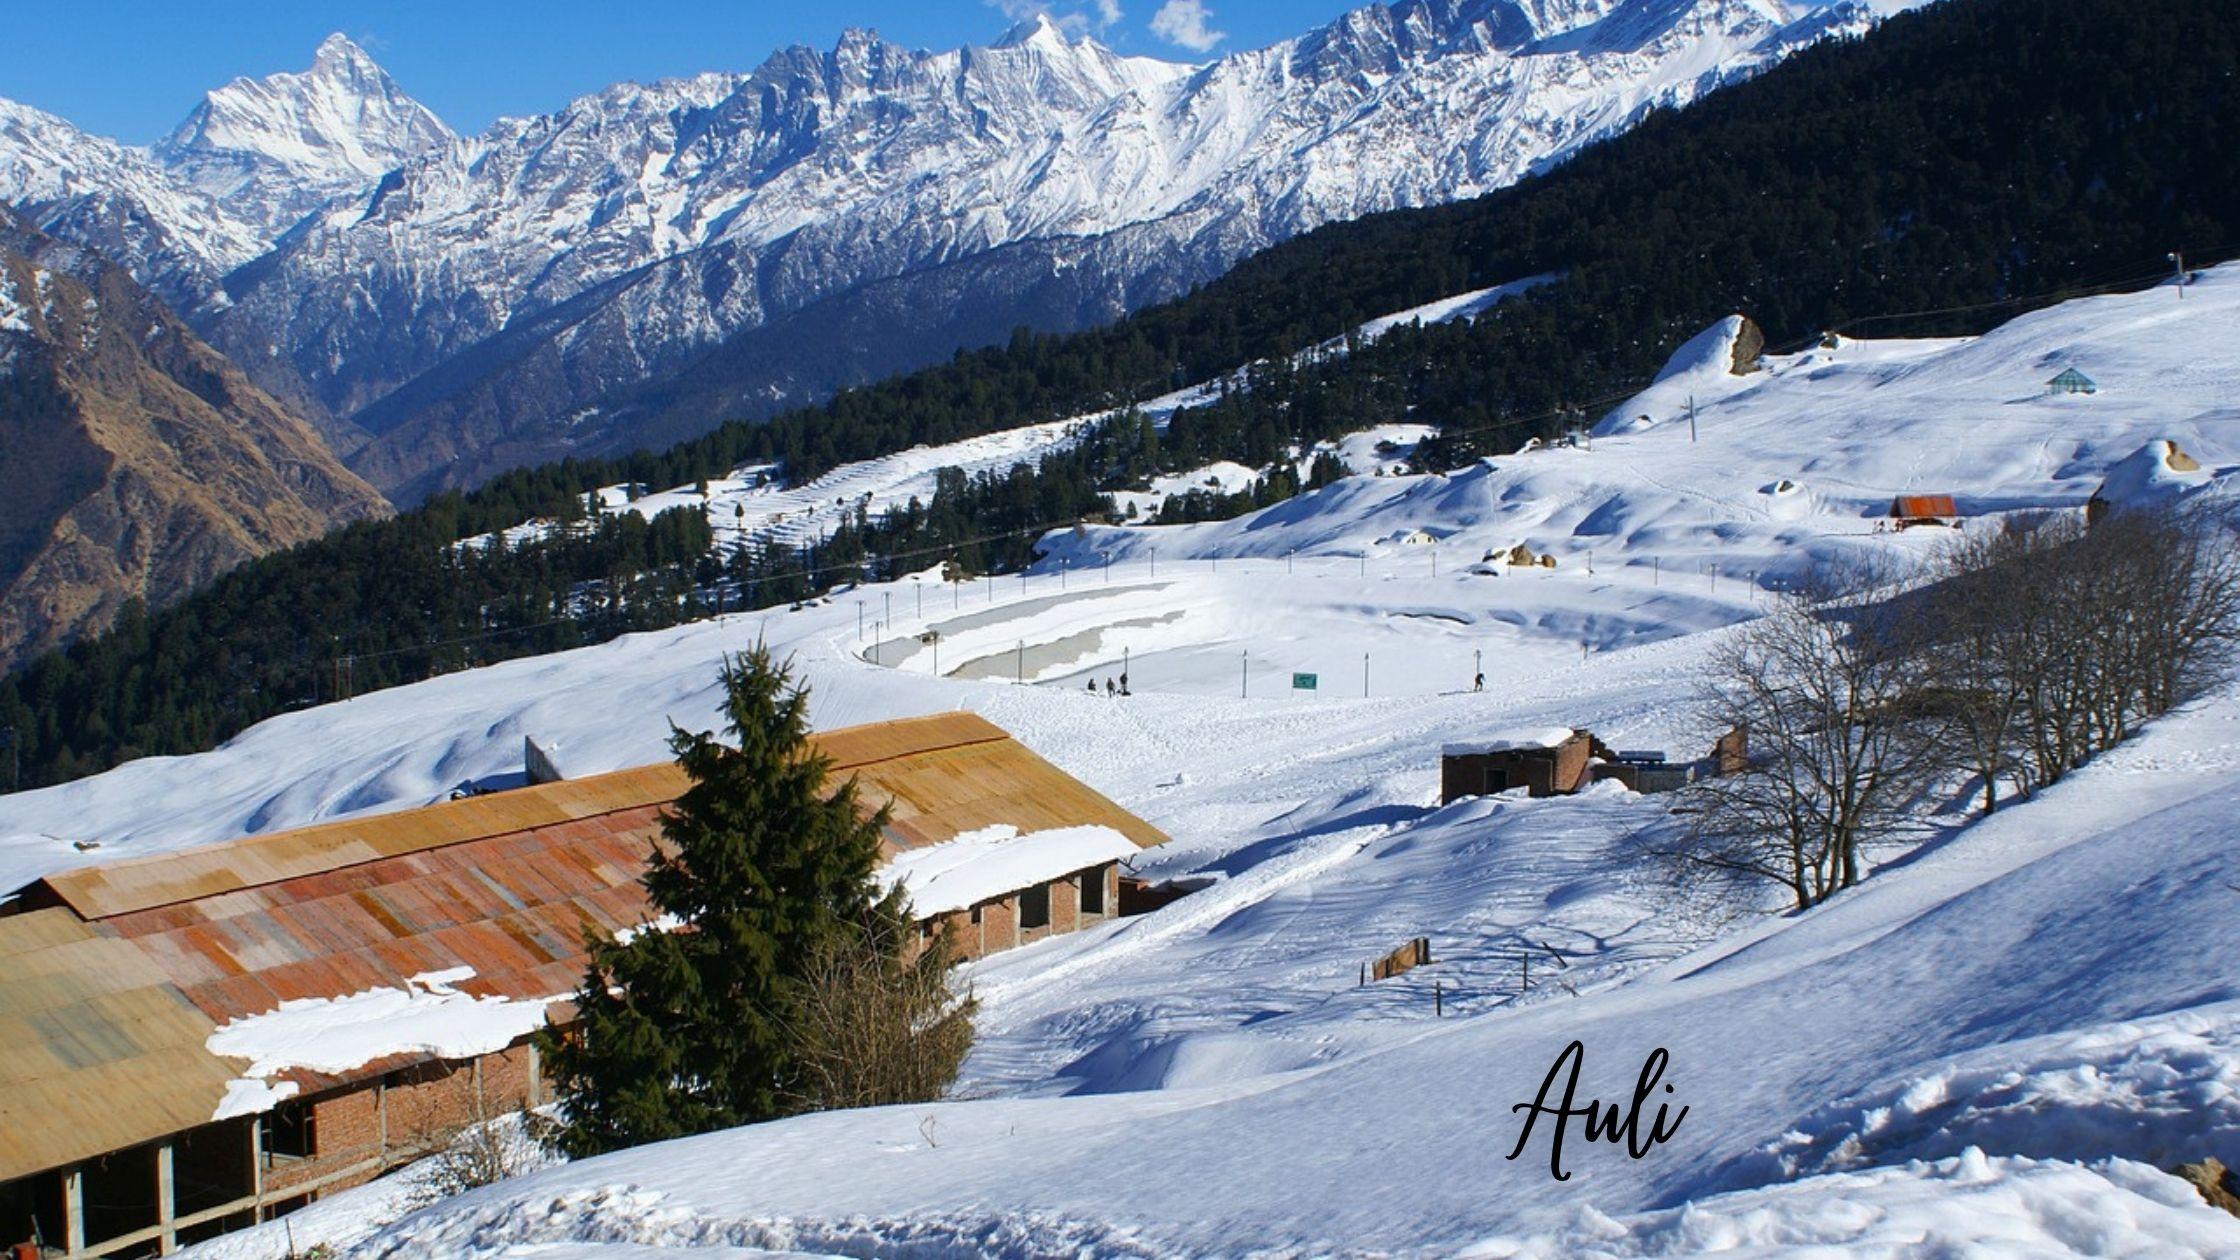 Auli - Snow Honeymoon Places in India